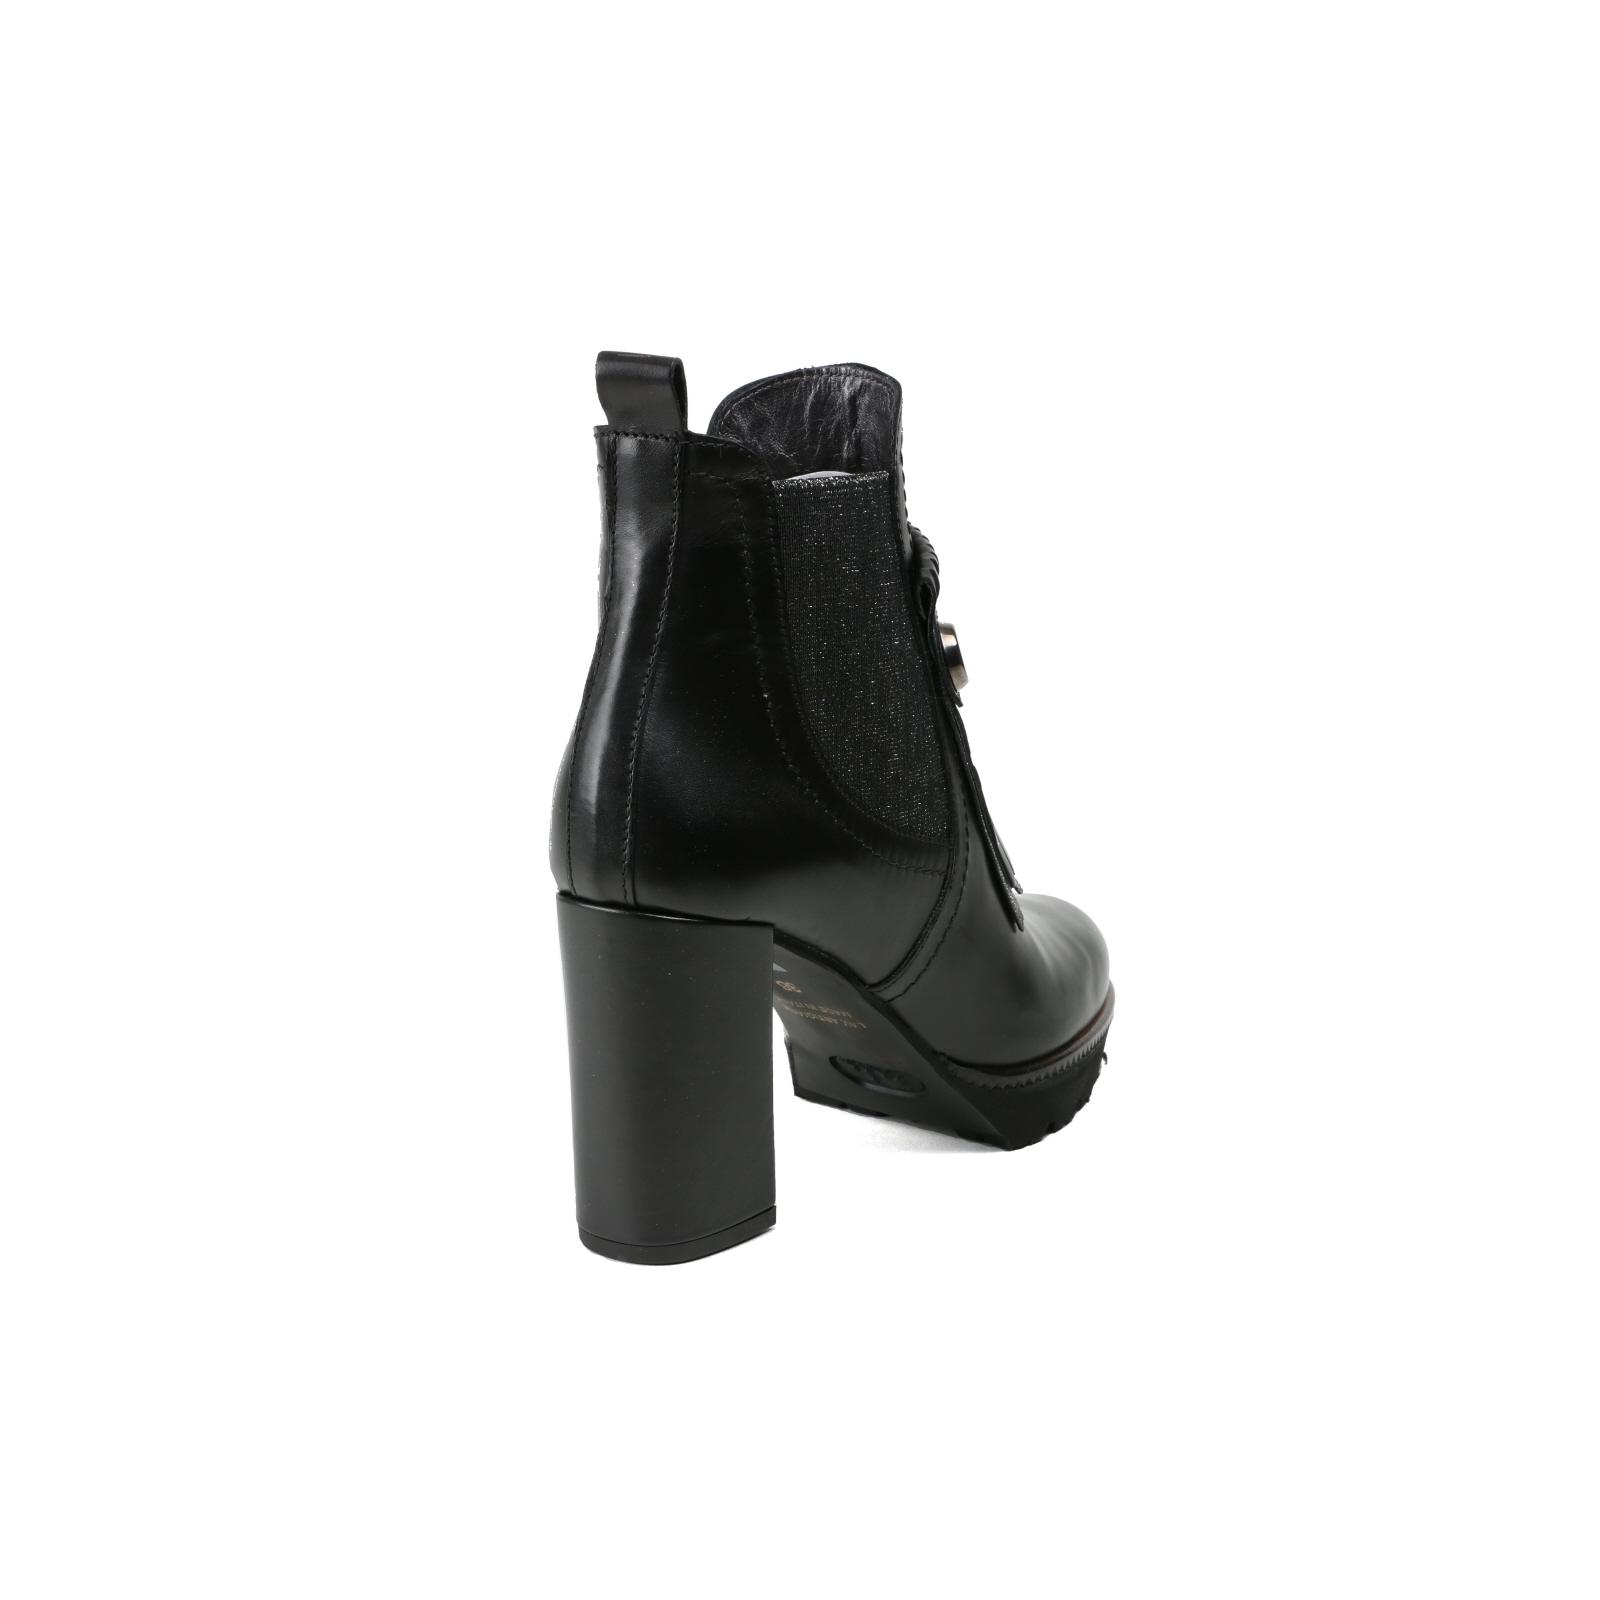 Leather New Black 37 Stivaletto Smooth da donna Maripe 'Fashion Gr cSFRx